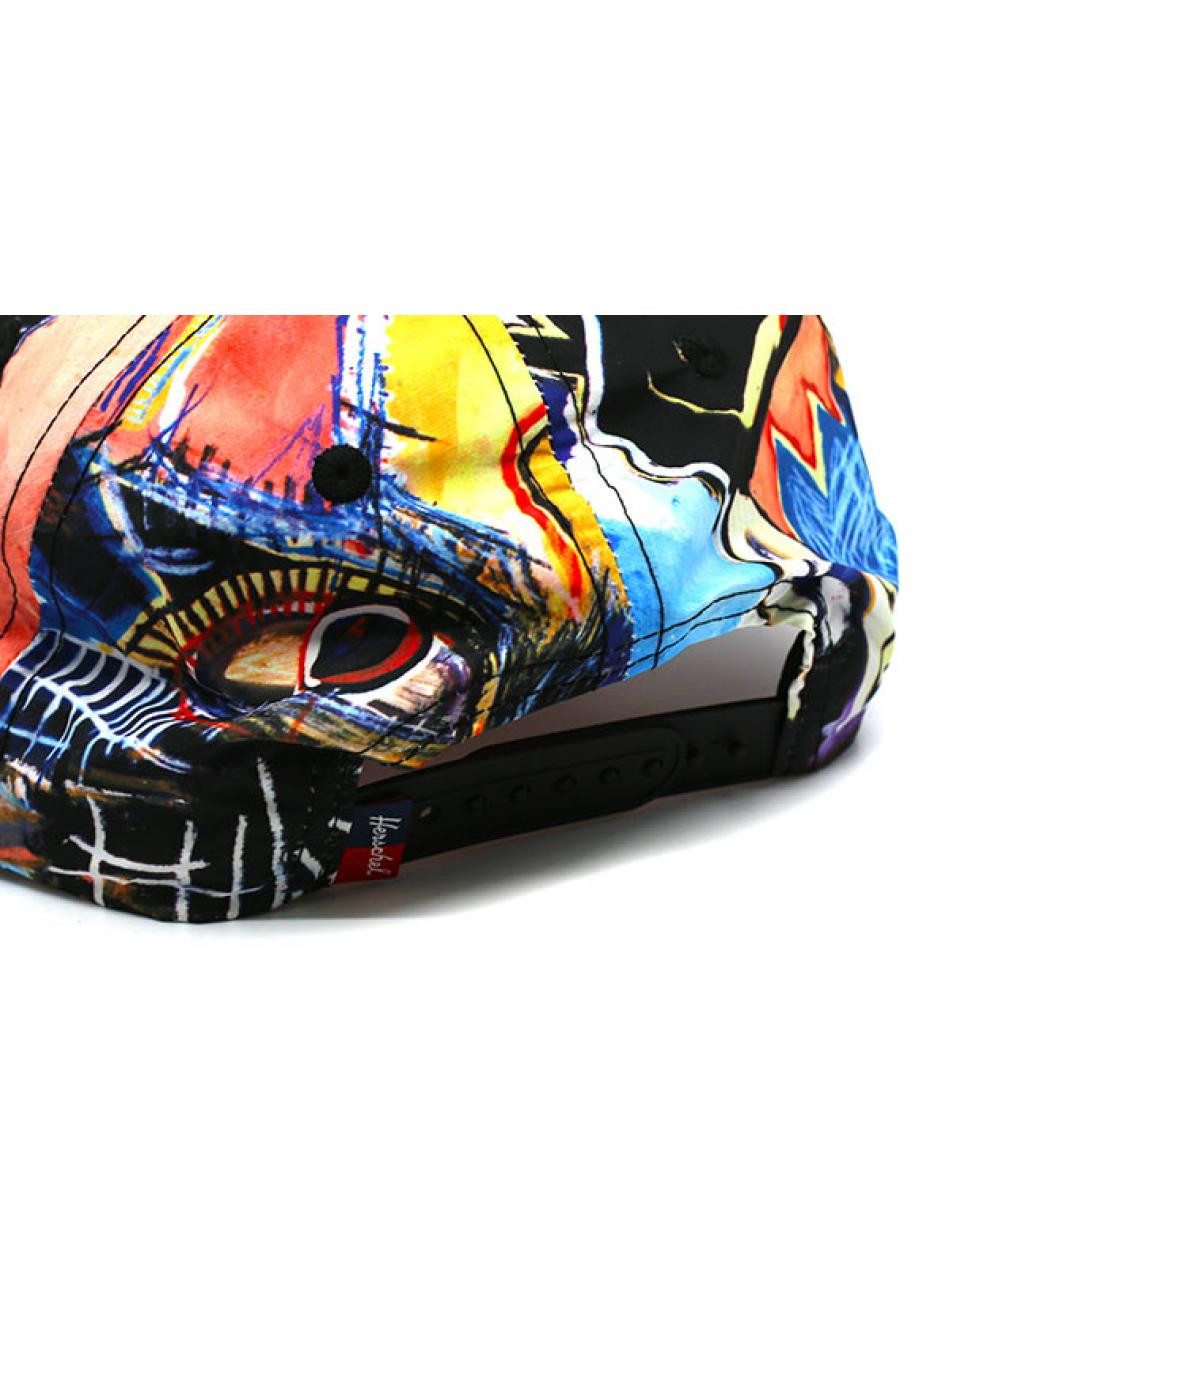 Dettagli Curve Basquiat Mosby Voyage - image 5